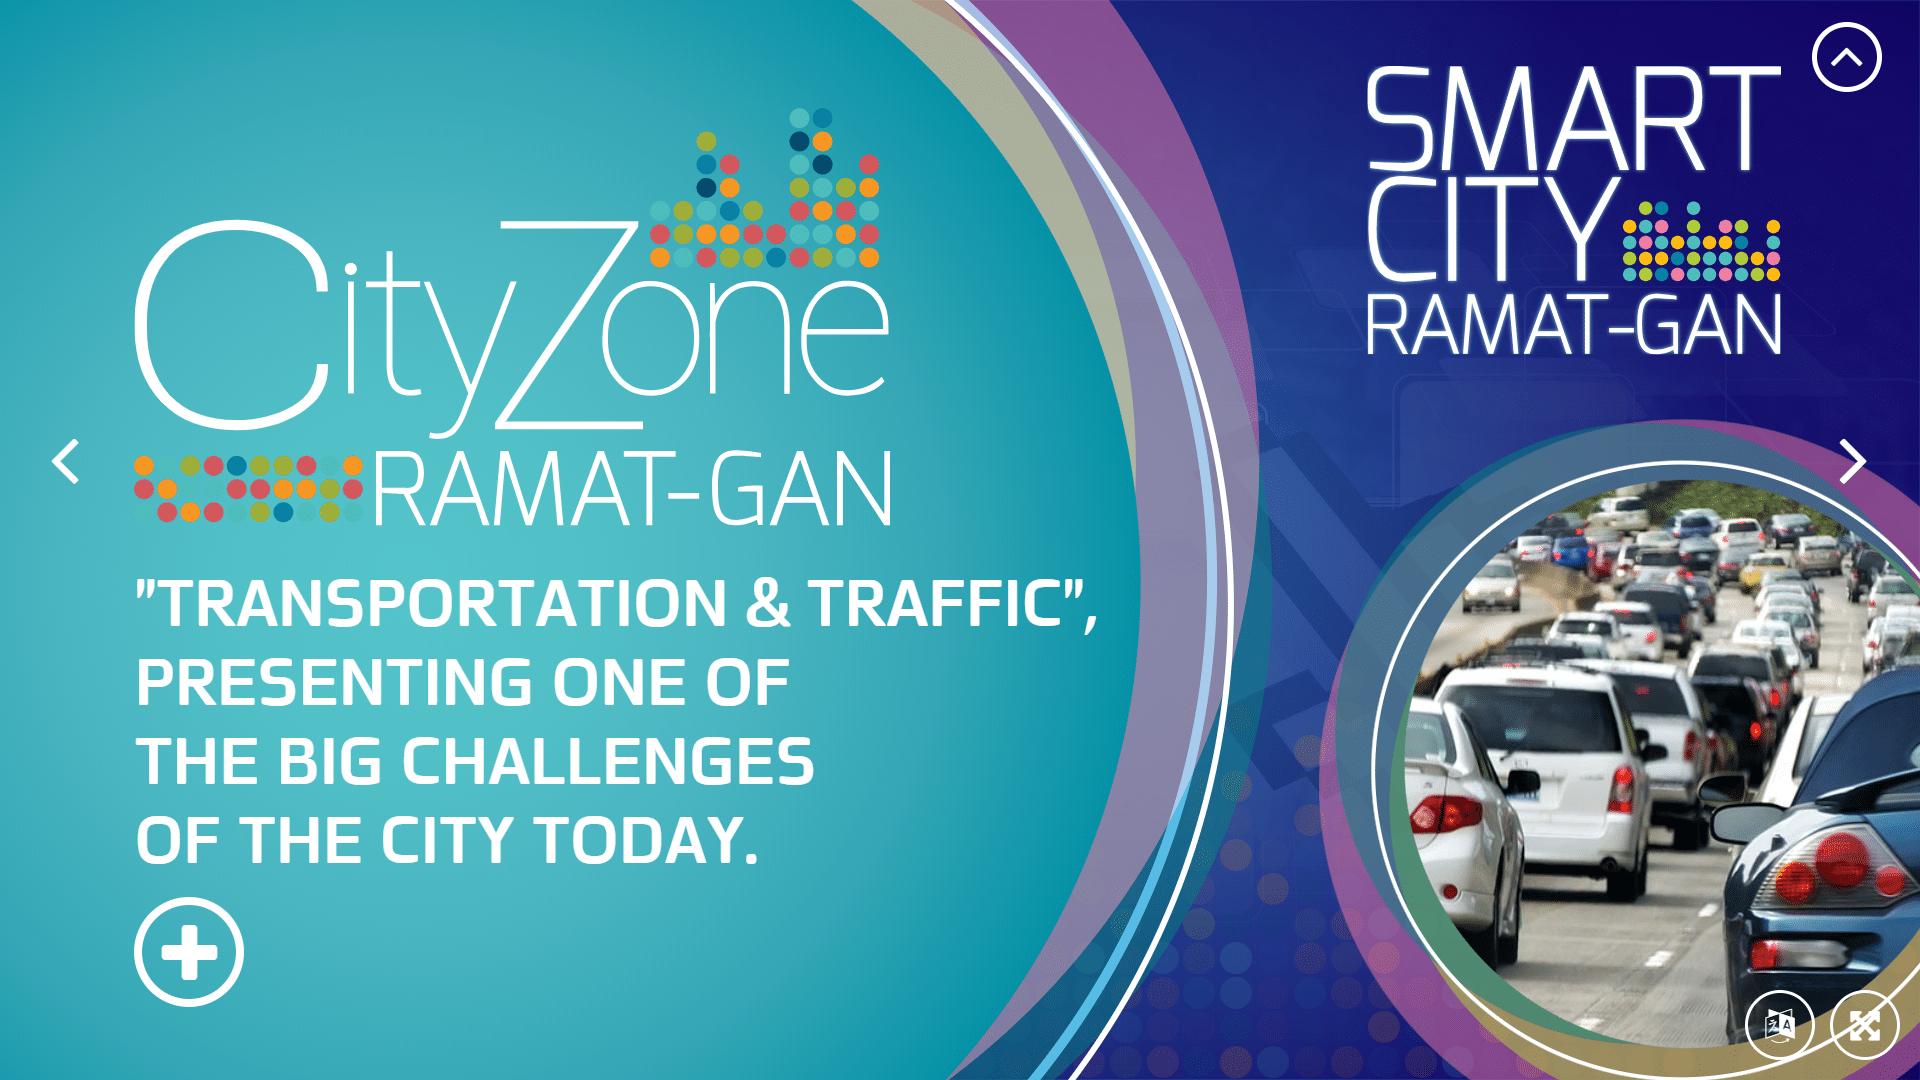 Smartcity2